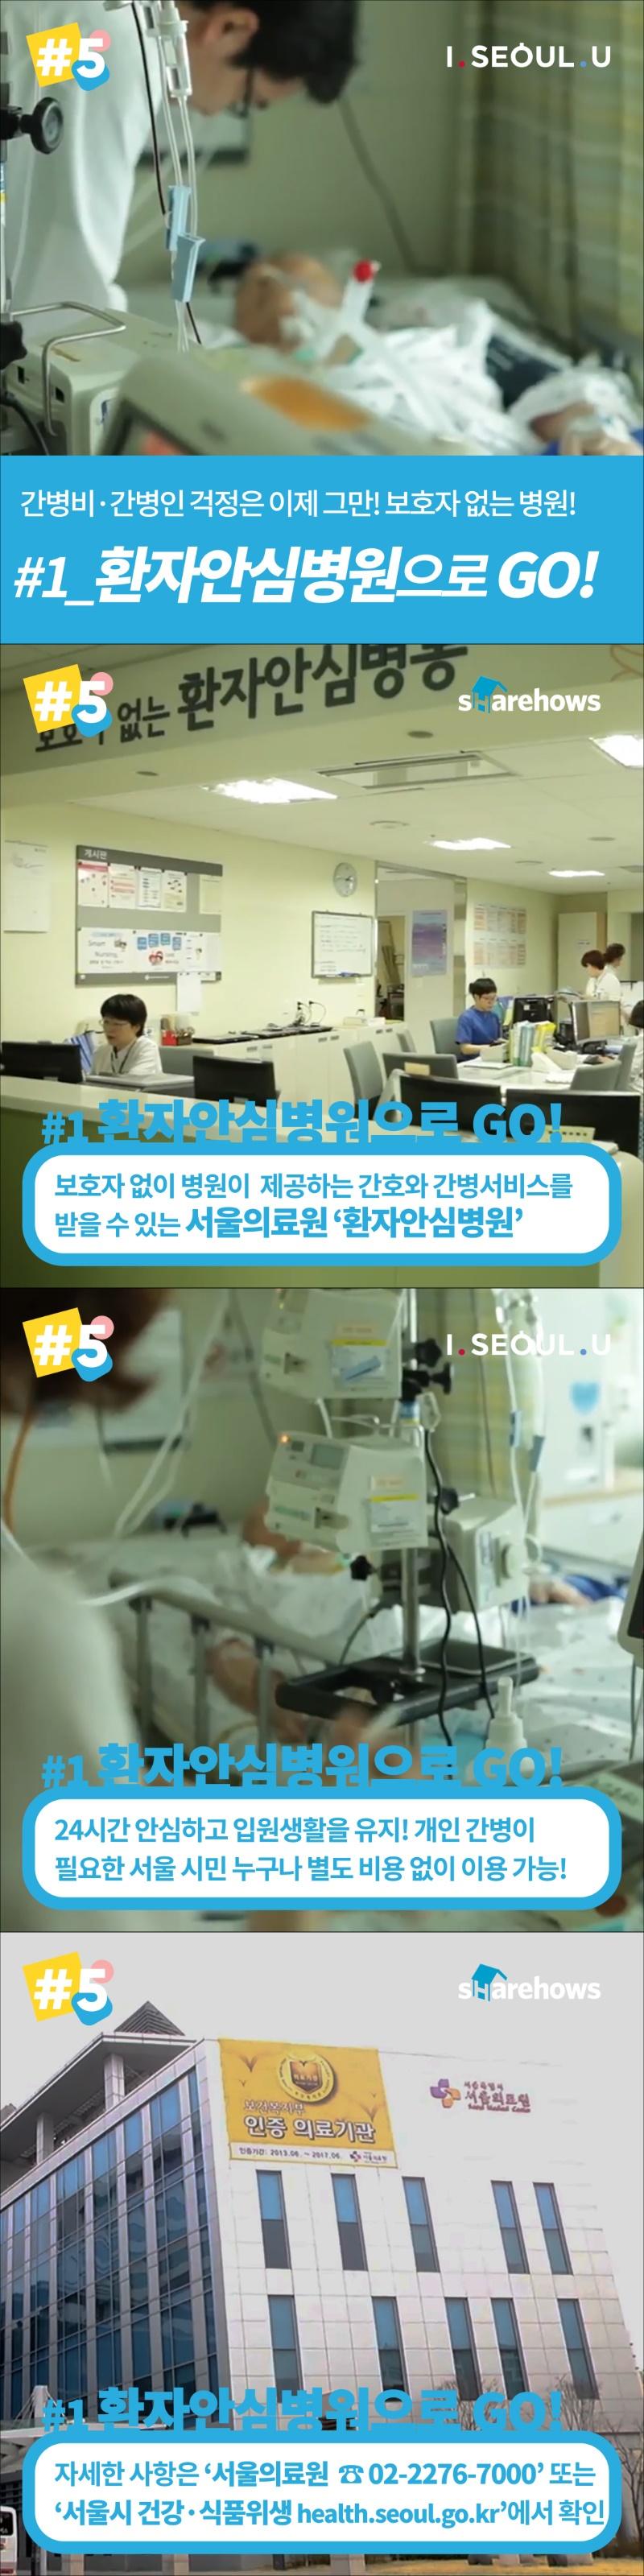 Medical service 01